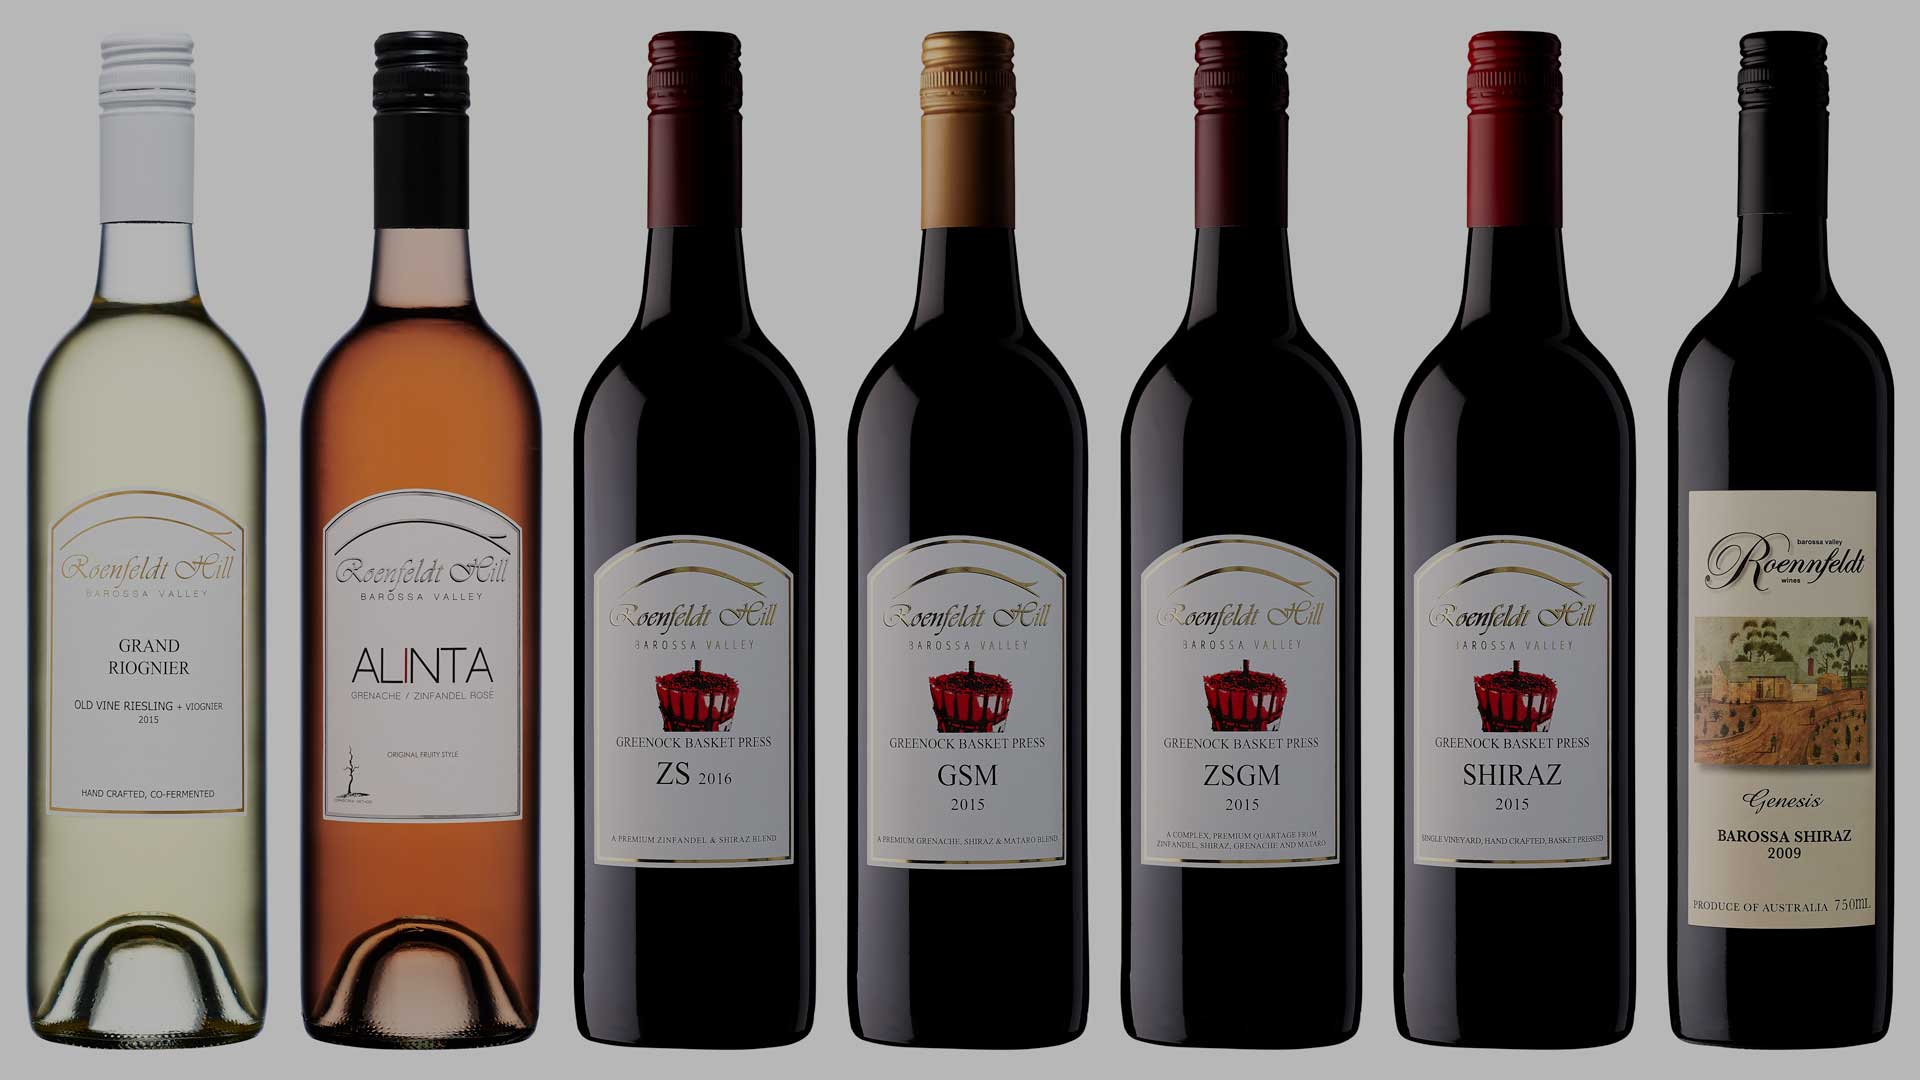 Roenfeldt Hill Wines